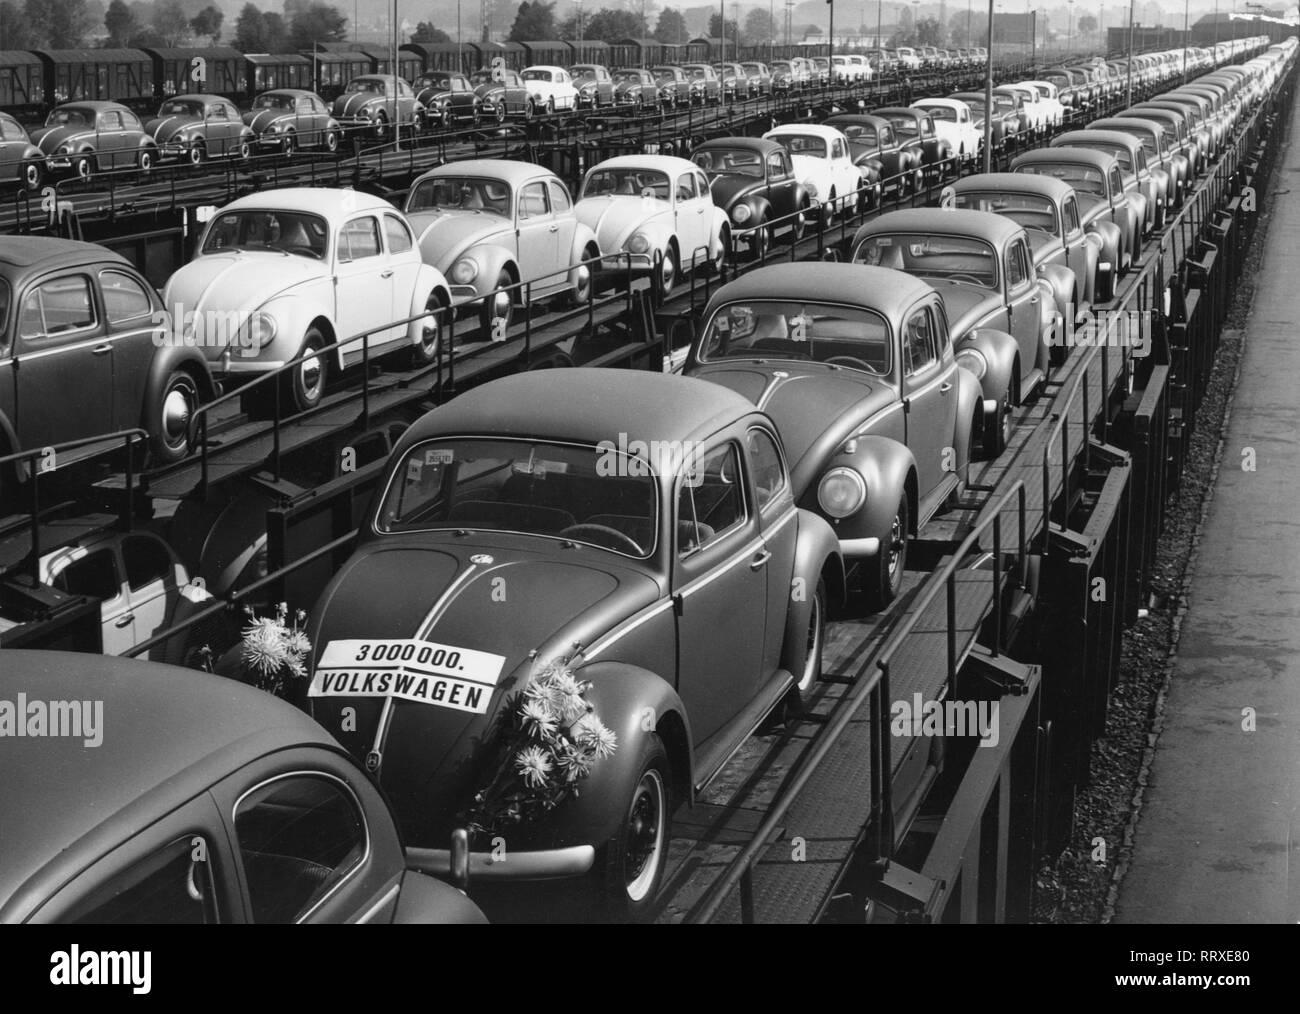 VW Beetle - VW, Käfer, Beetle, Werk, Wolfsburg, Bahnhof, Zug, Güterzug - Stock Image